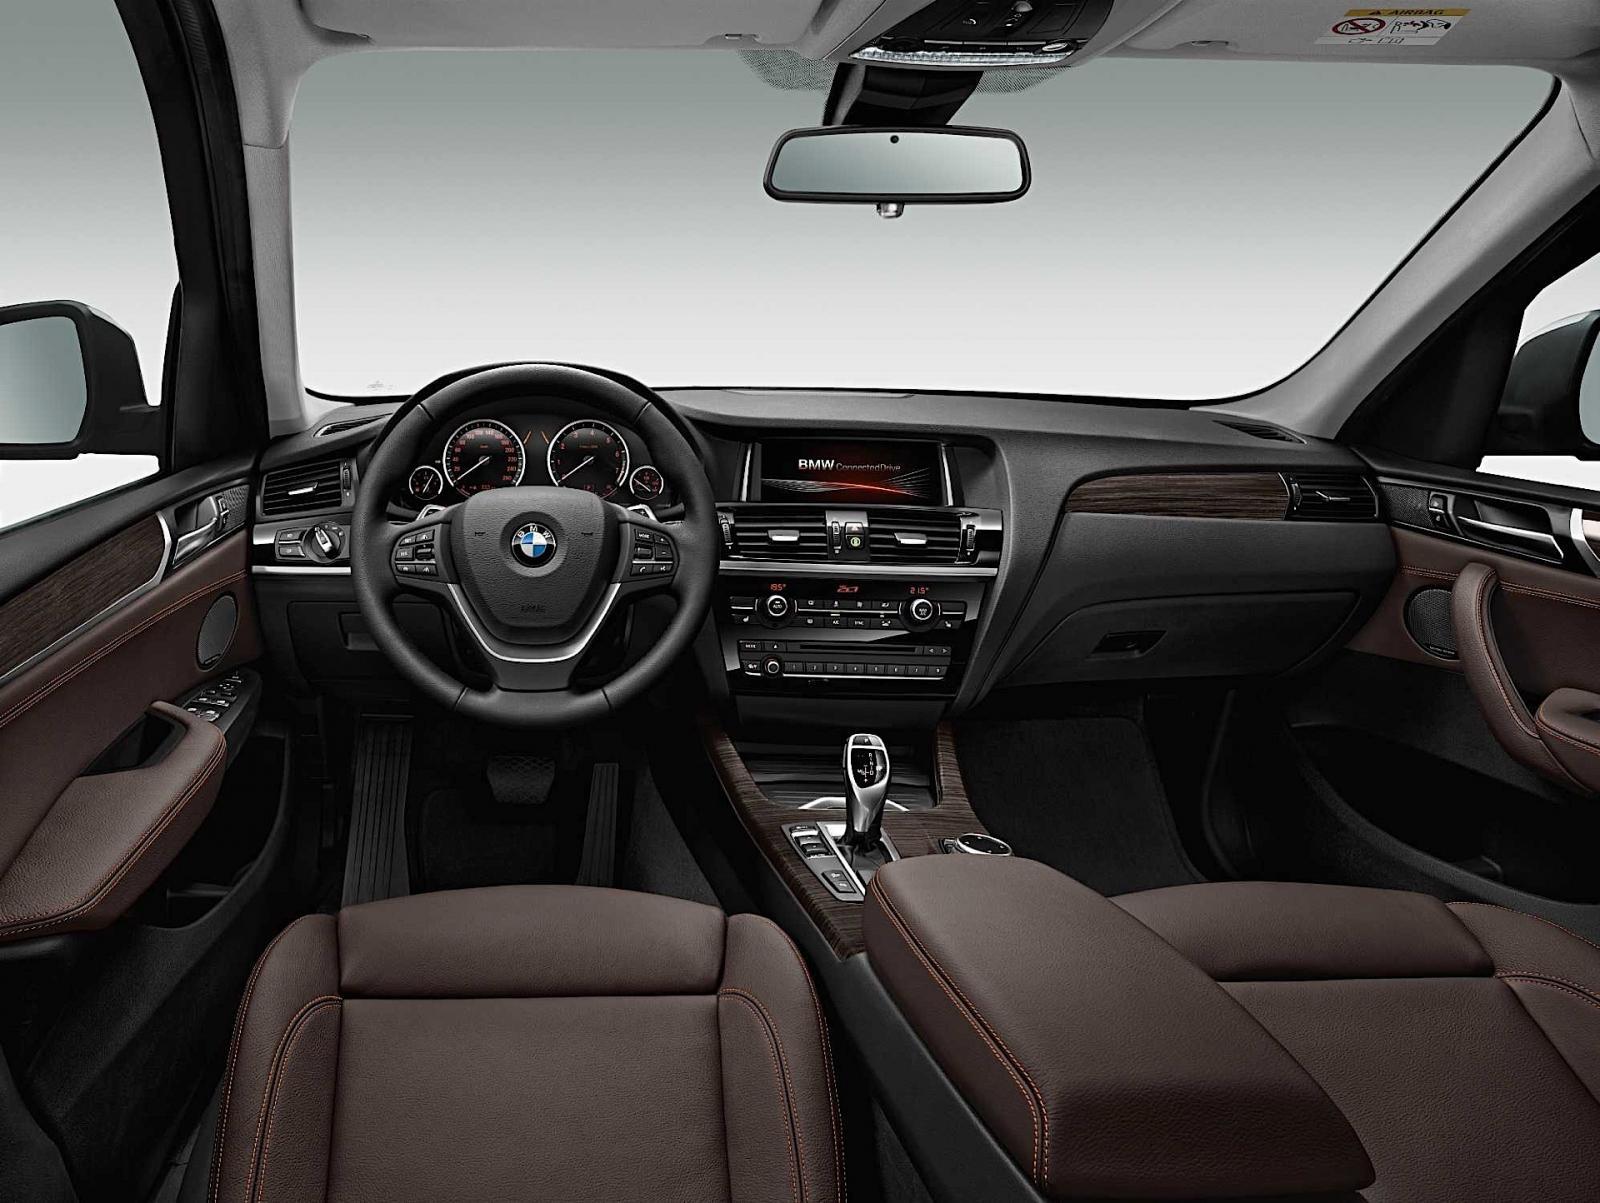 BMW X3 F25 interior